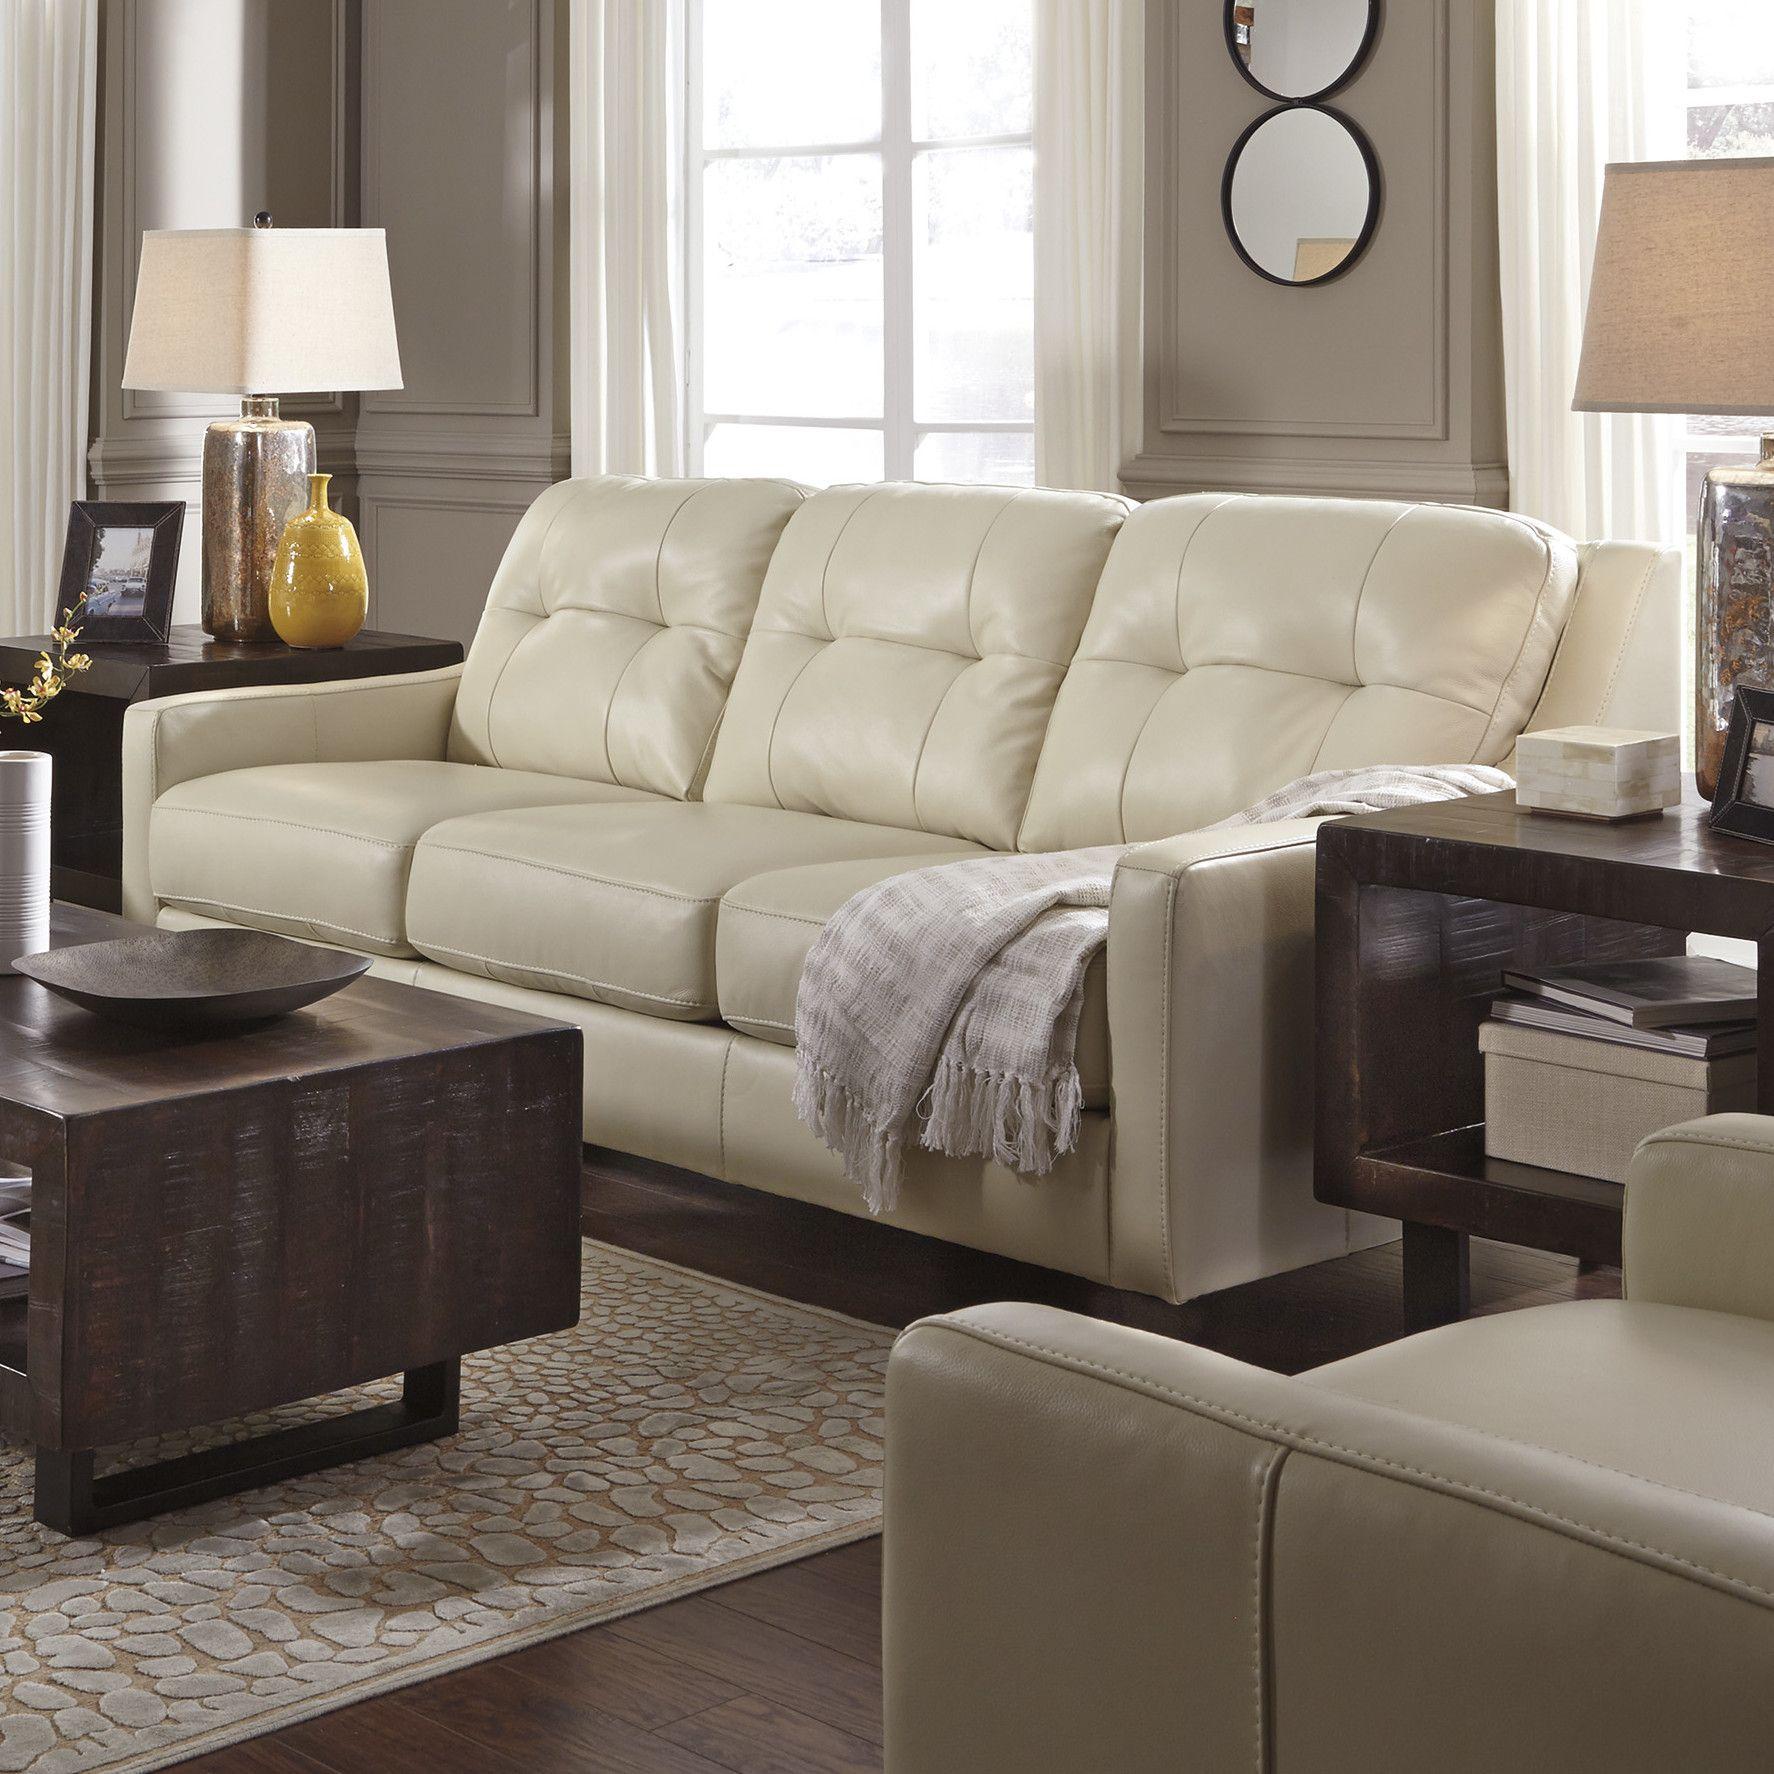 Wellston Leather Queen Sleeper Sofa